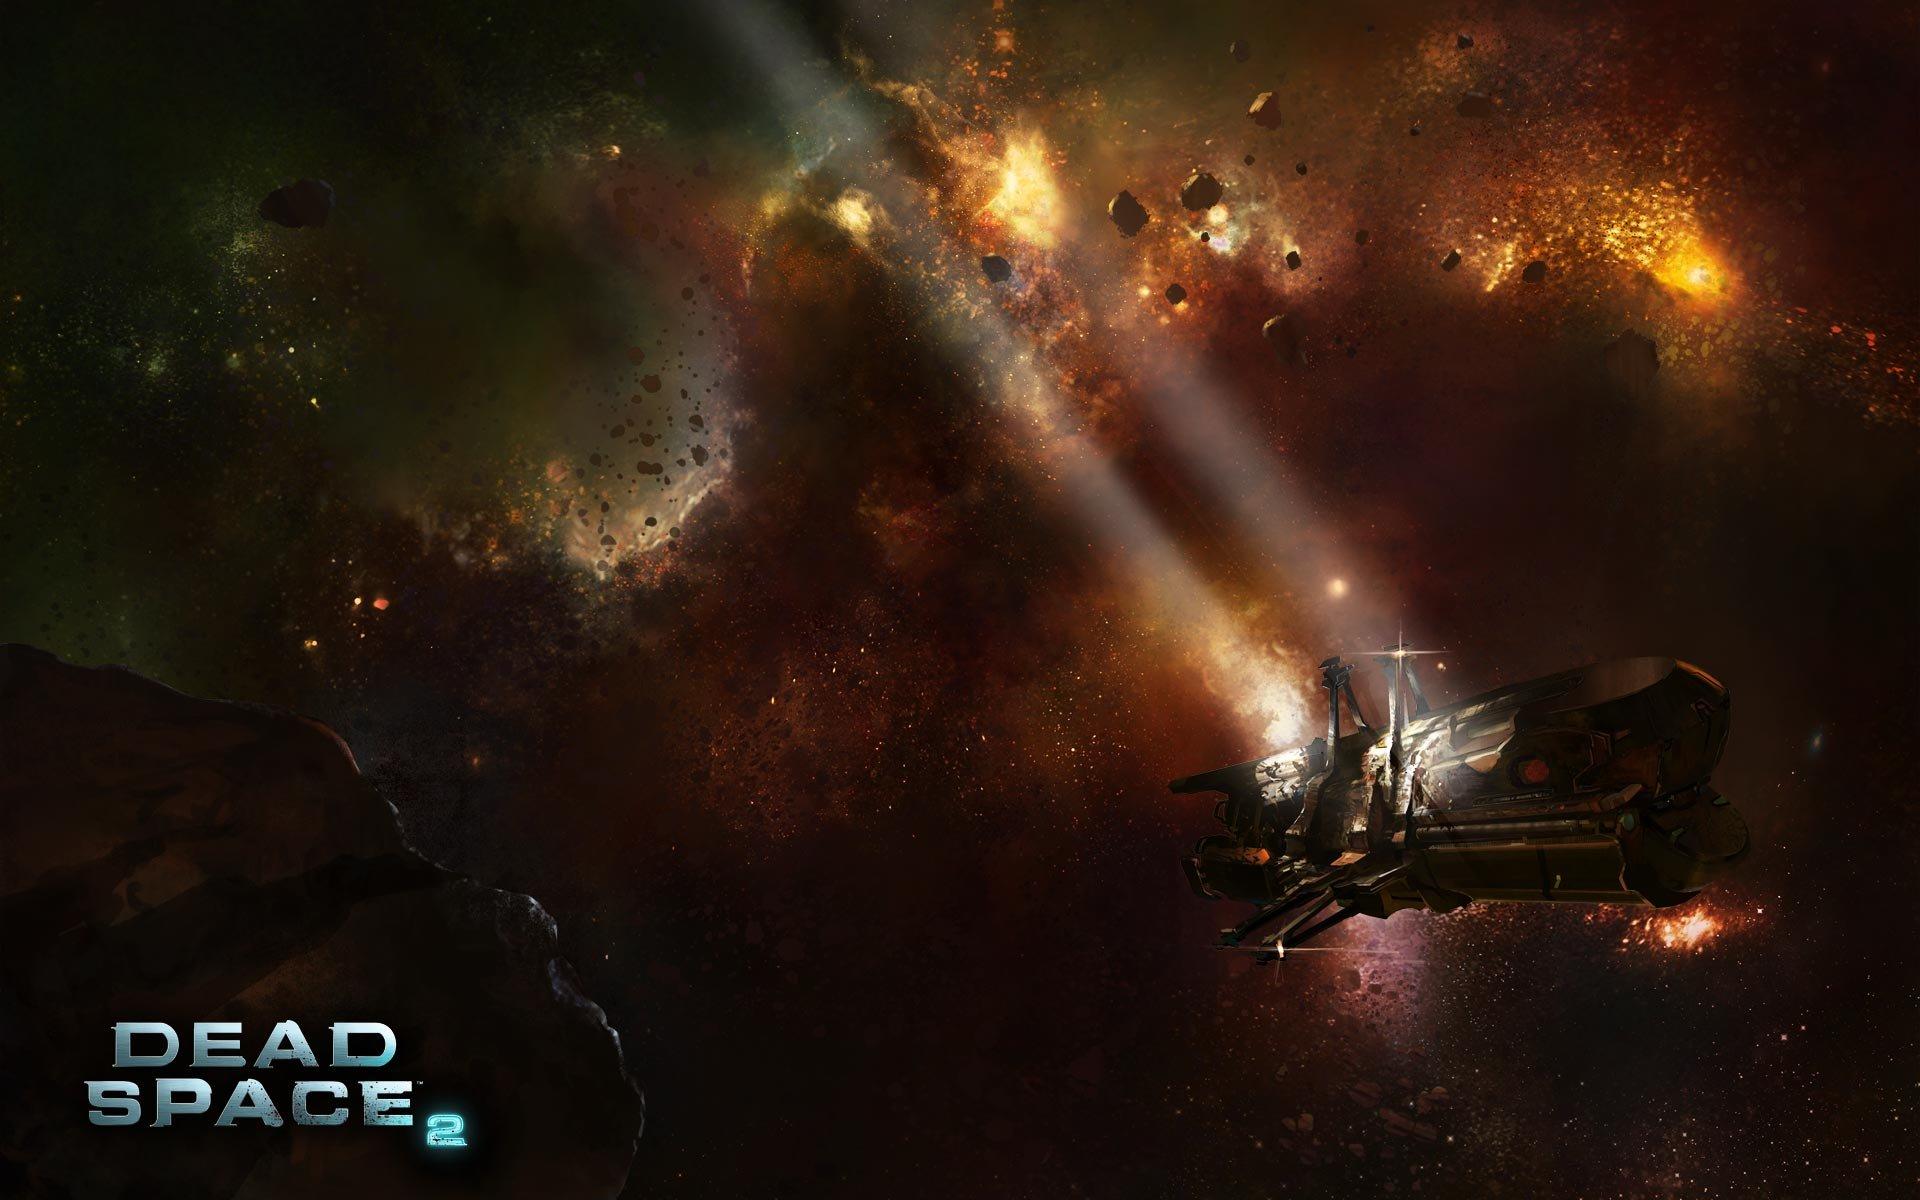 Dead Space 2 Wallpapers Hd For Desktop Backgrounds